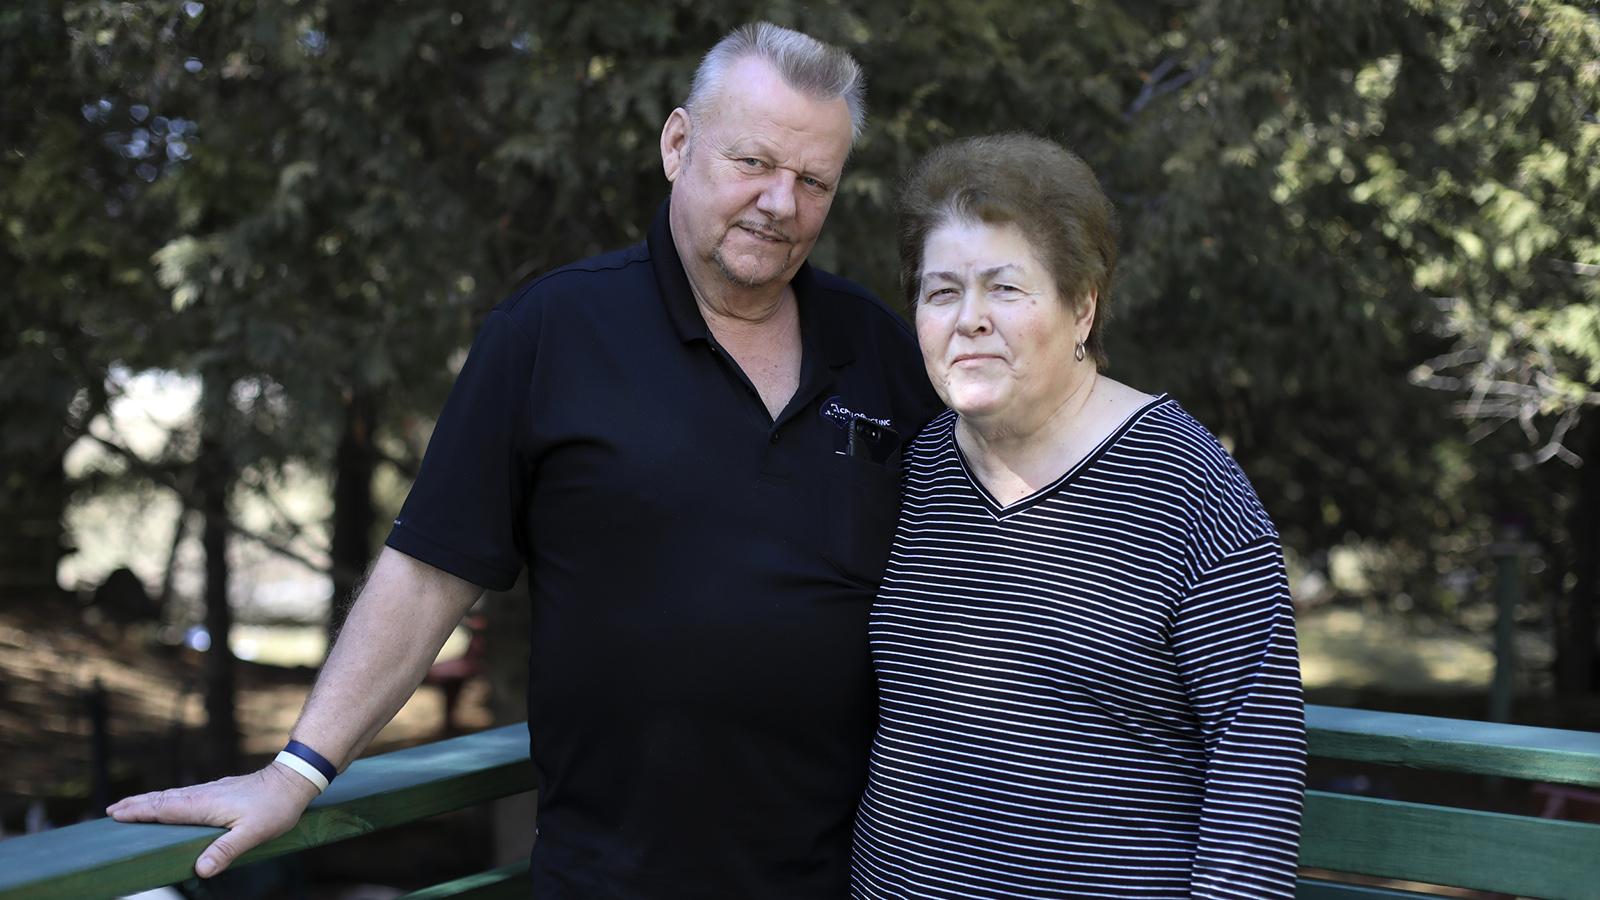 Portrait of two people standing in backyard deck.